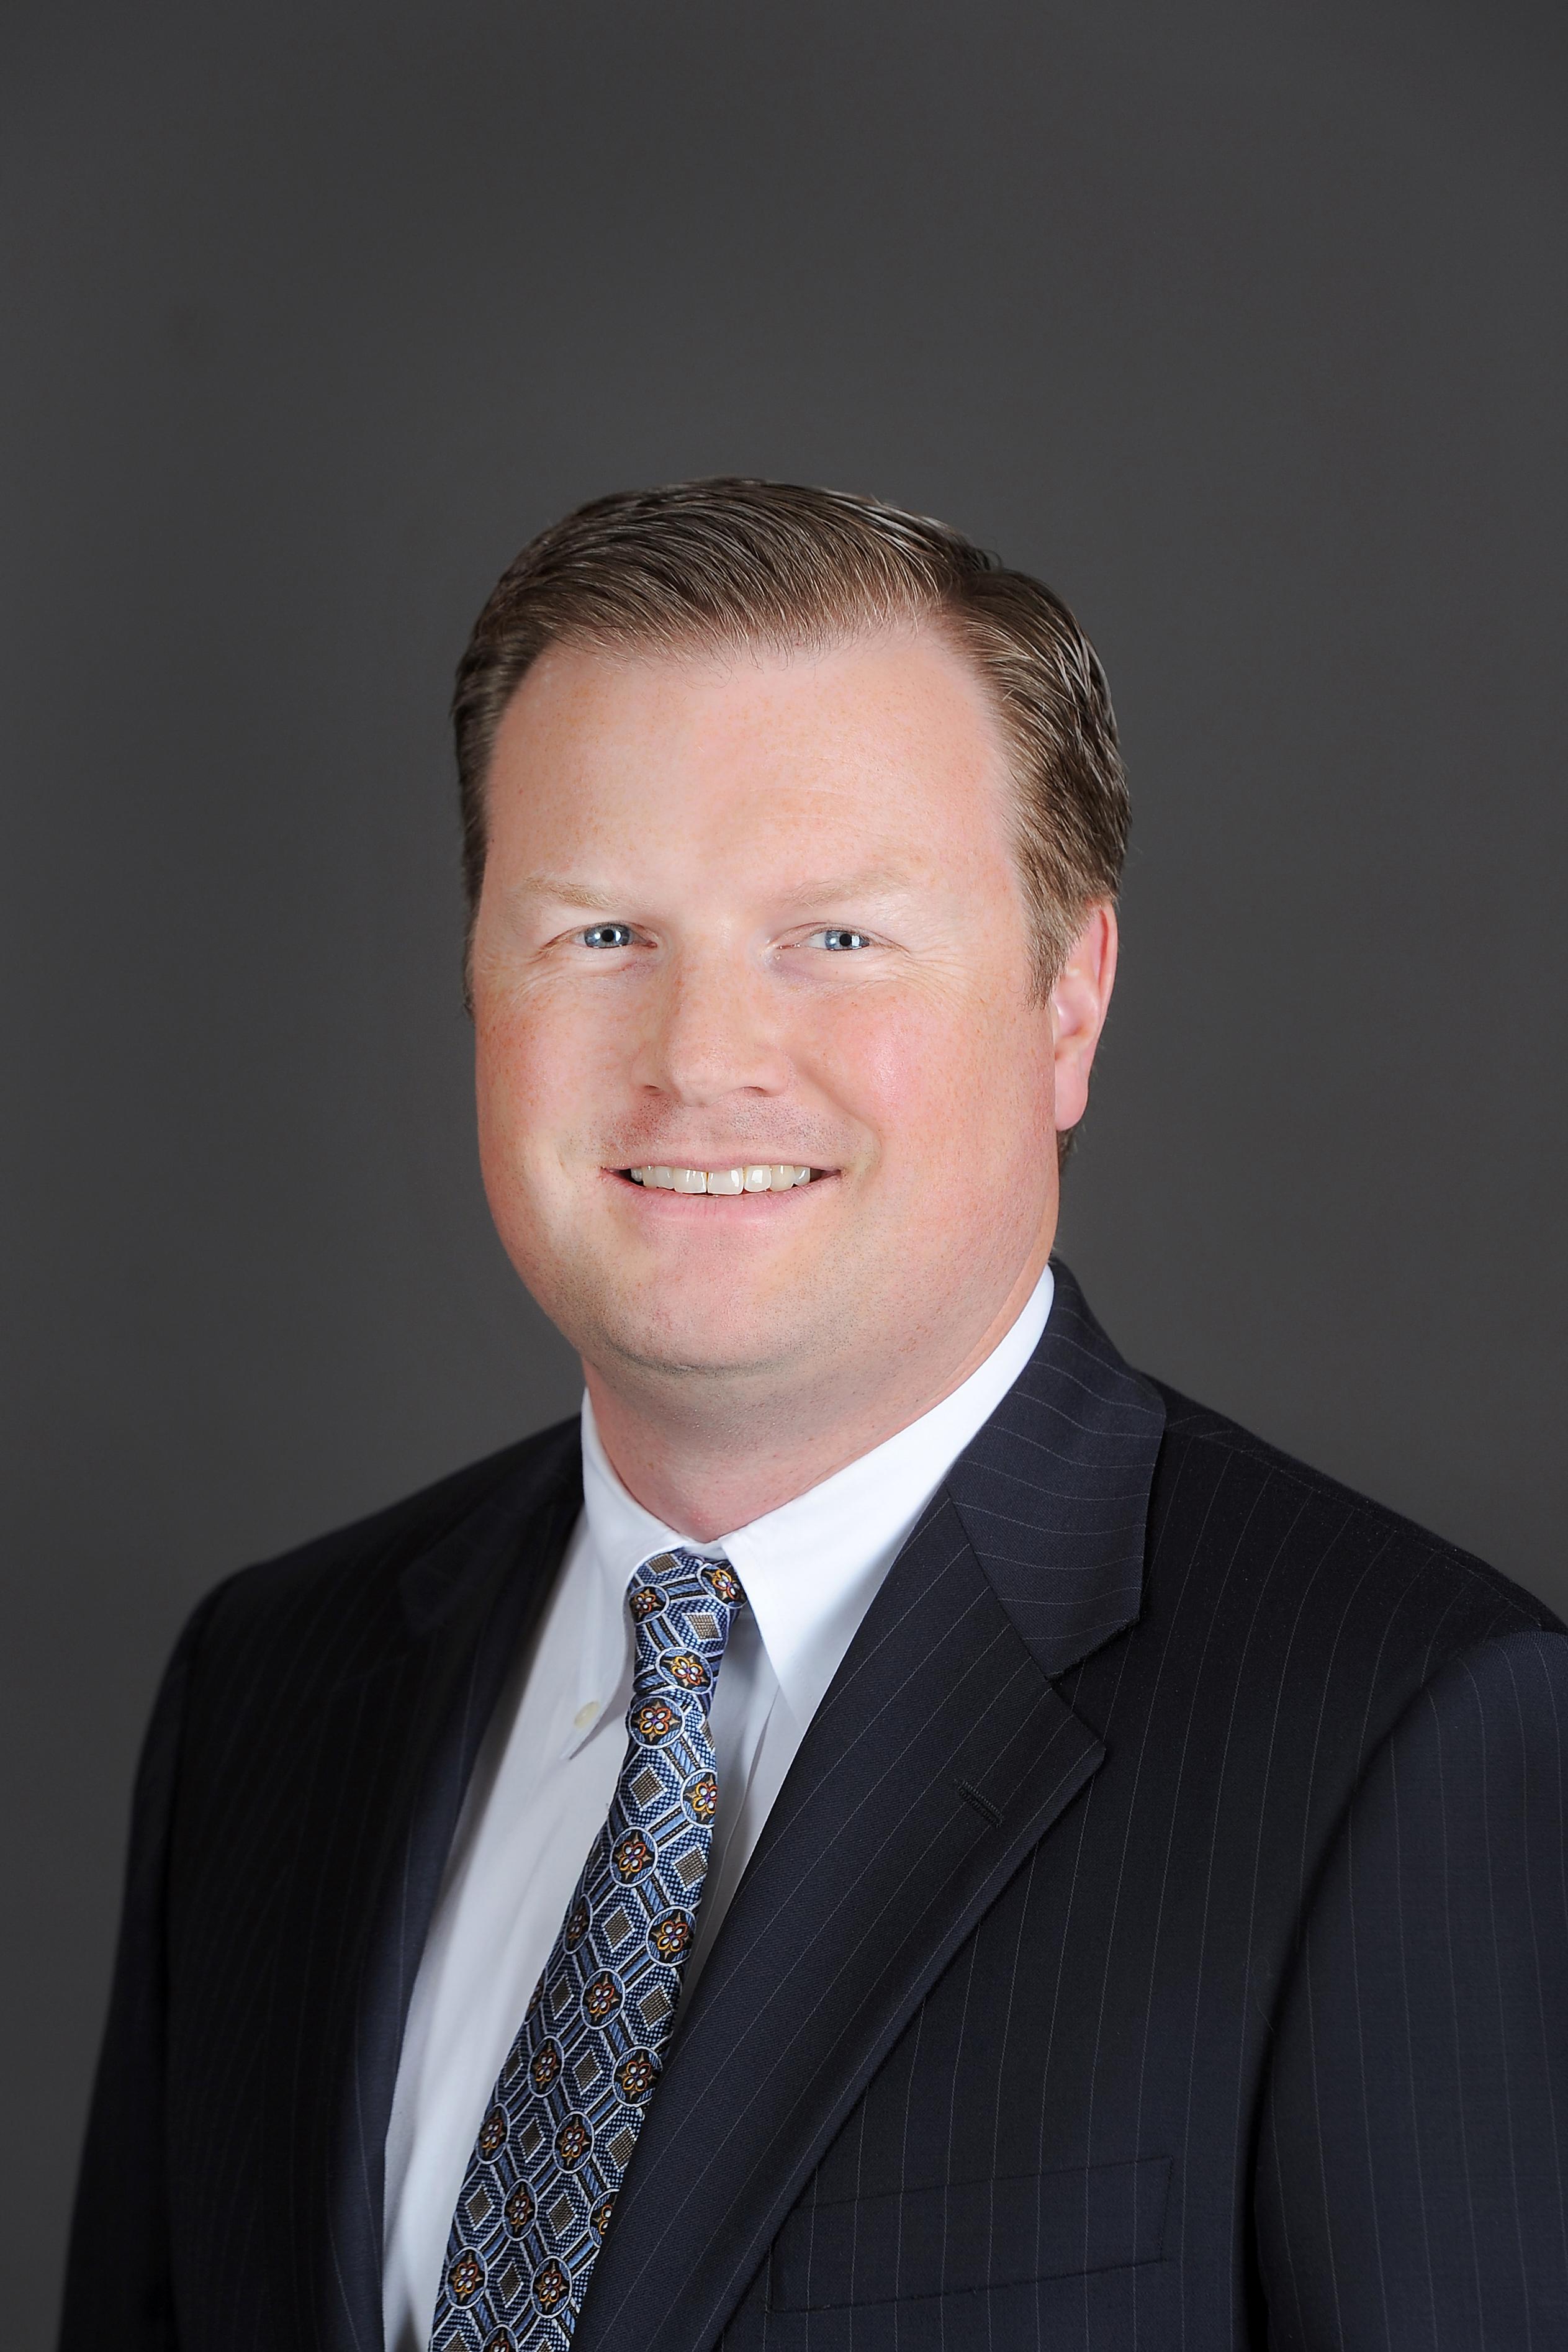 John Swieringa, DISH Senior Vice President and Chief Information Officer (Photo: Business Wire)